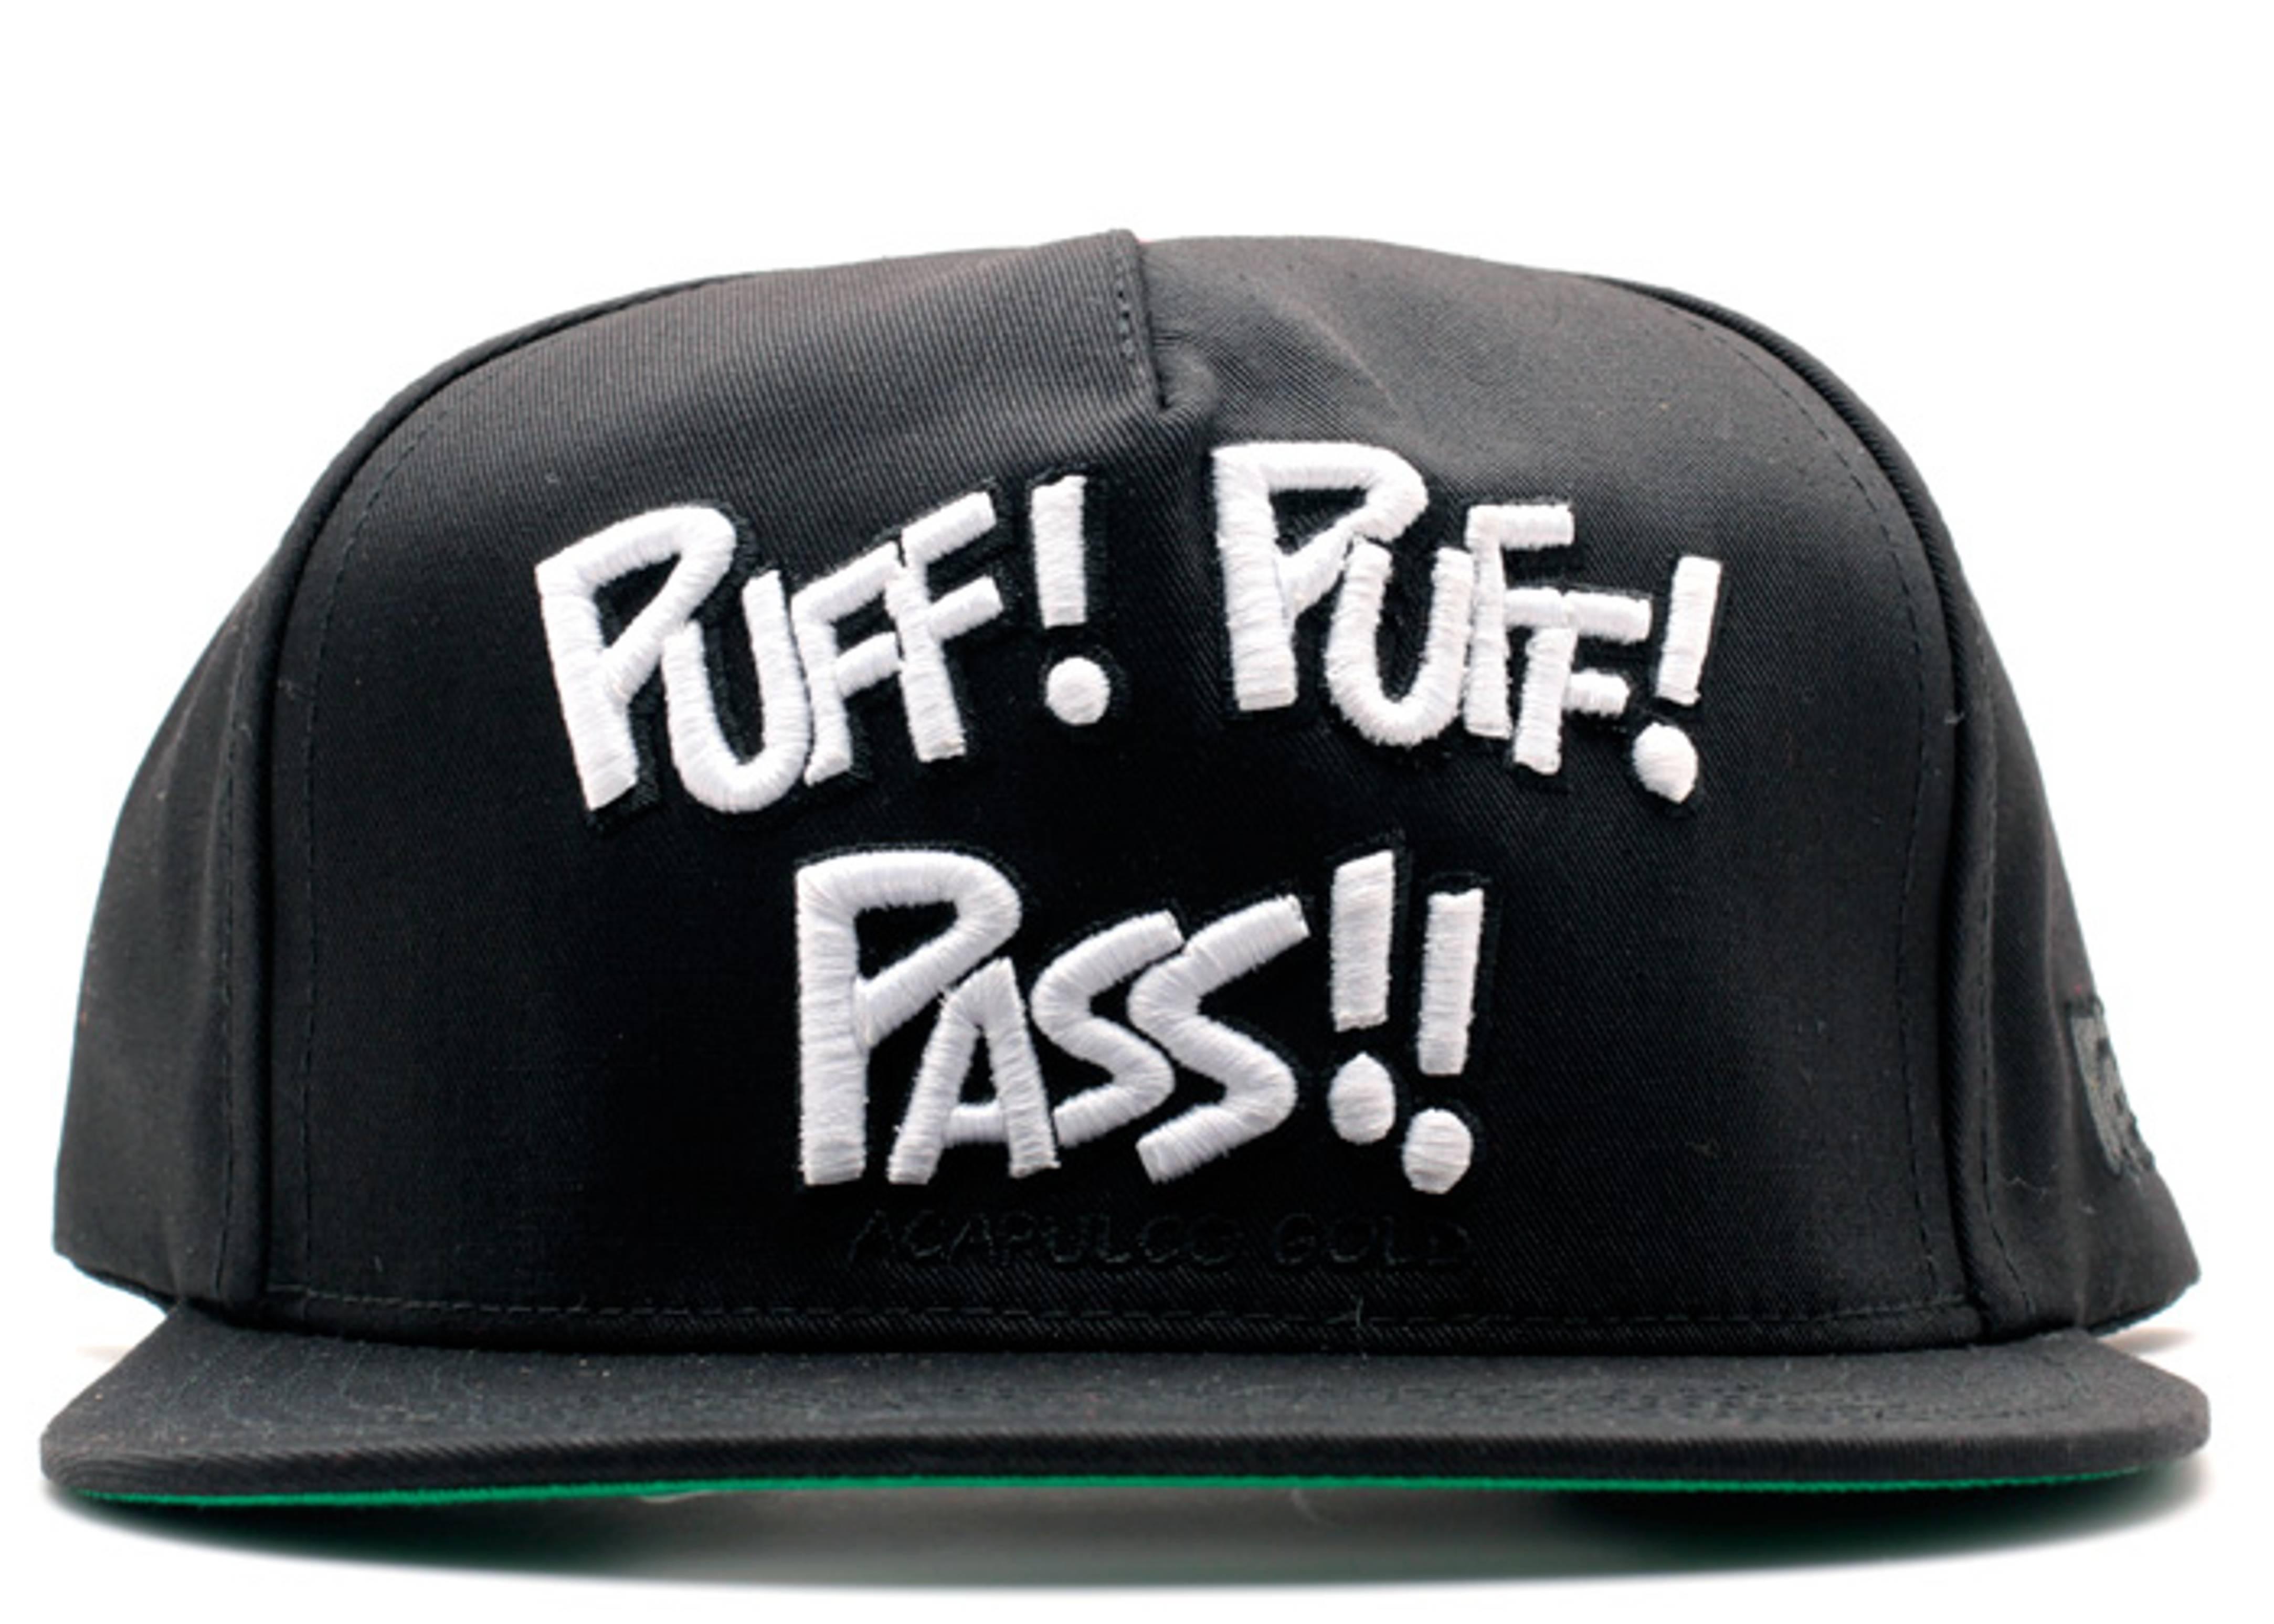 puff puff pass snap-back